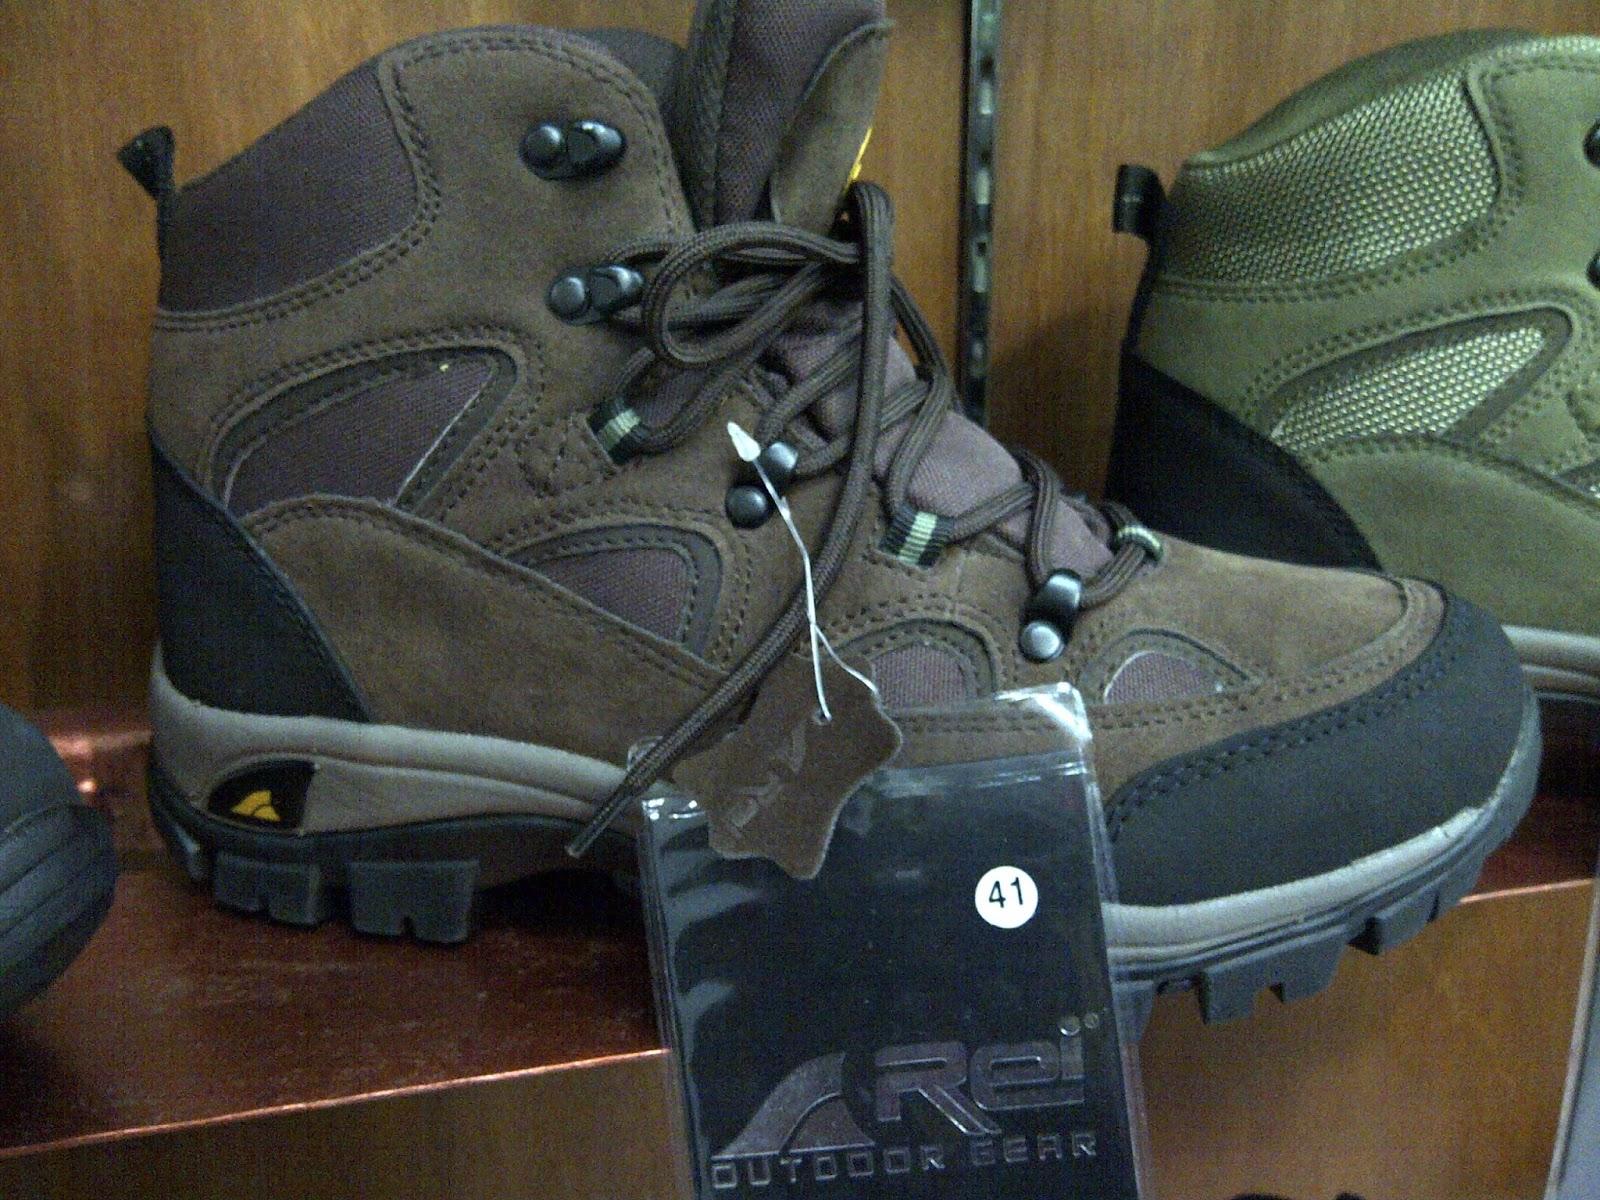 Harga dan Spesifikasi Sepatu Gunung Rei Nebraska T-736 7eb1d75360